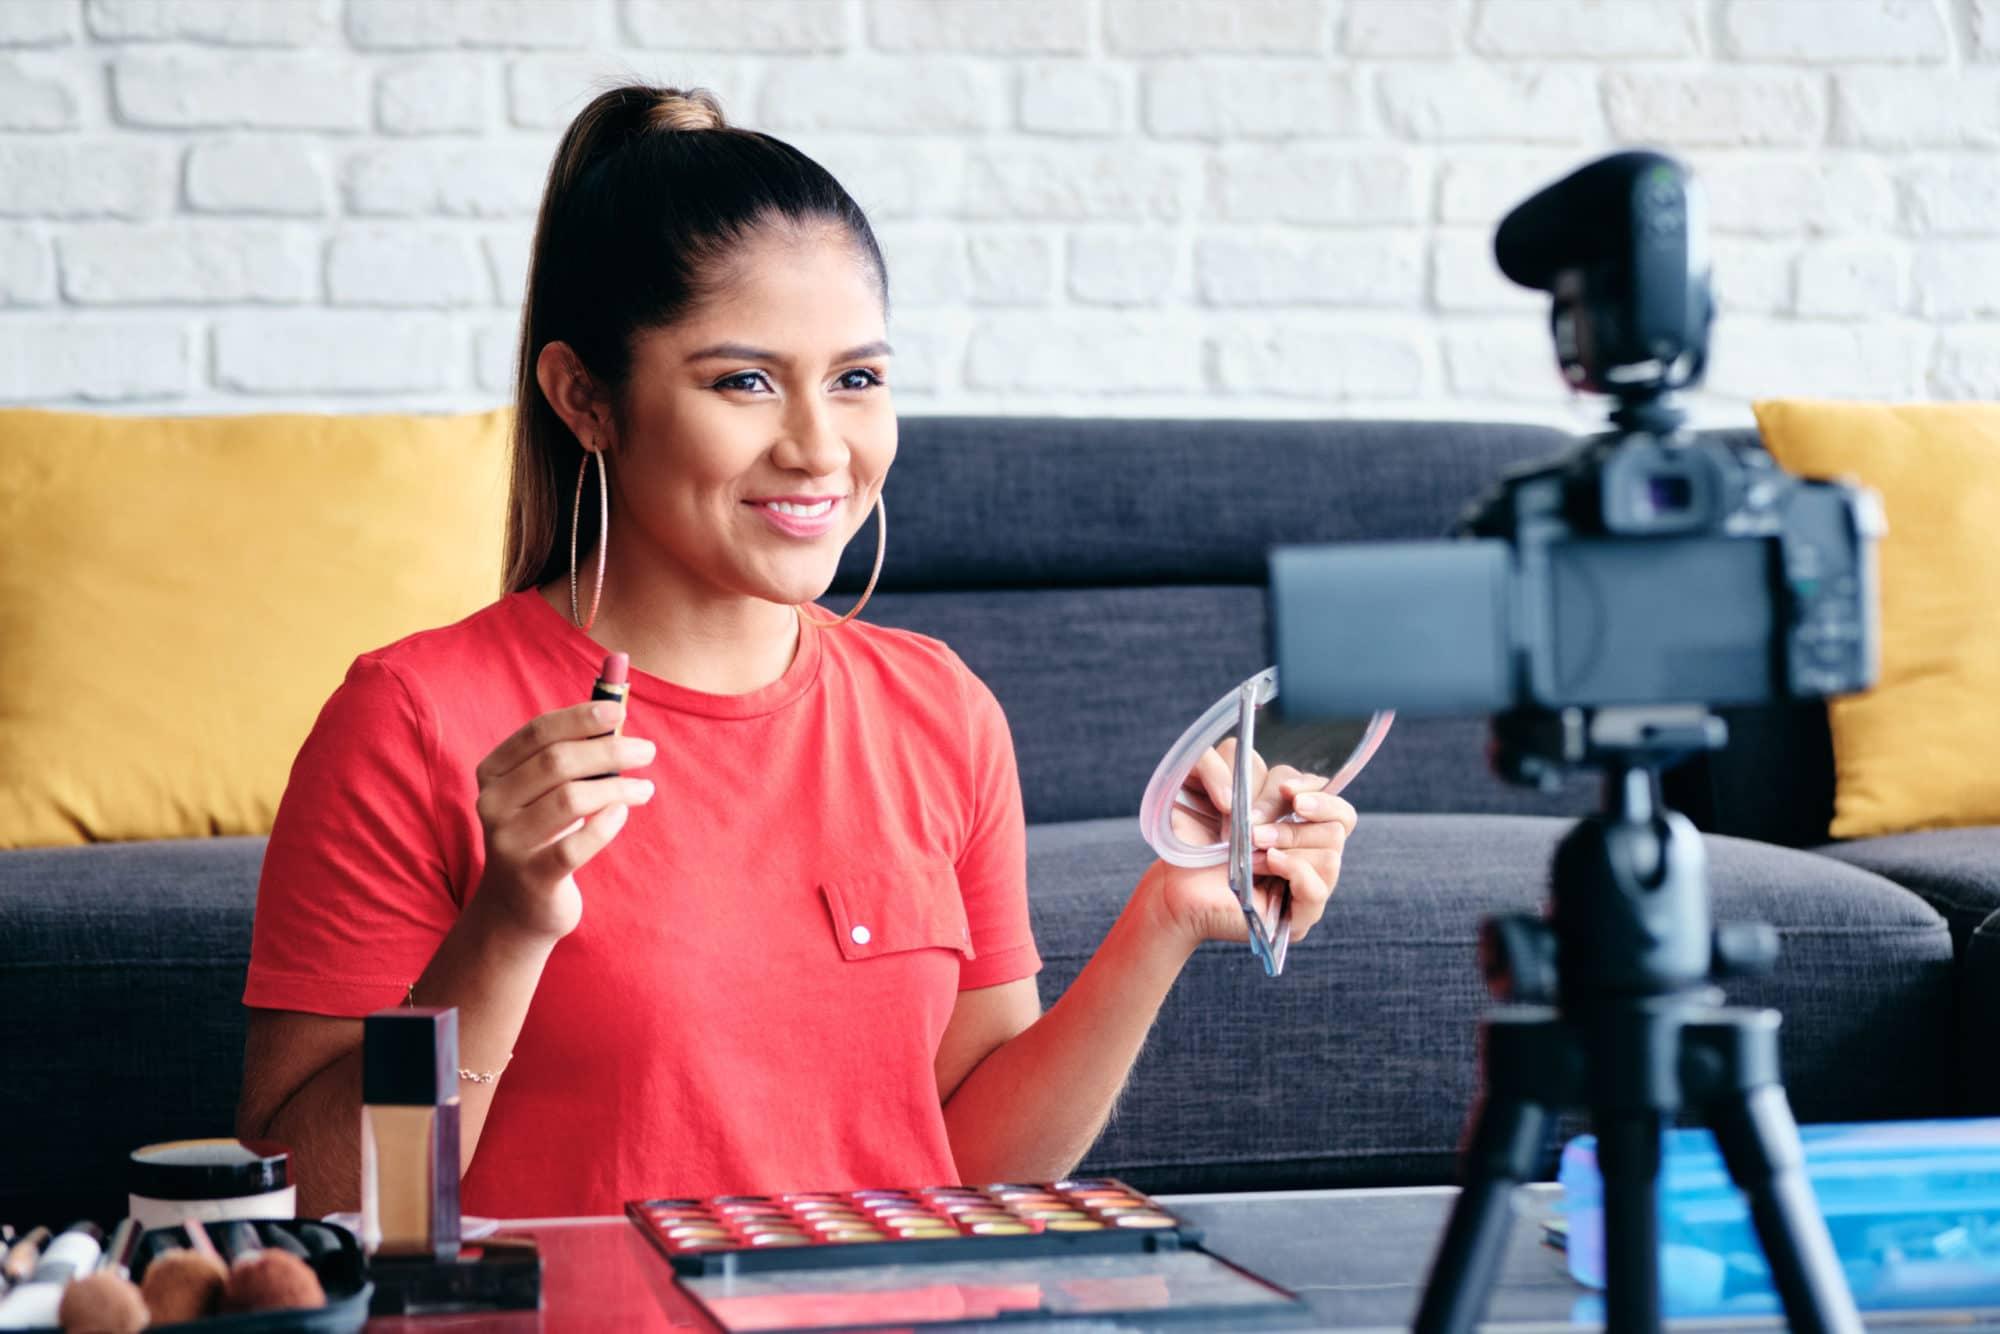 Girl Recording Vlog Video Blog At Home With Digital Camera